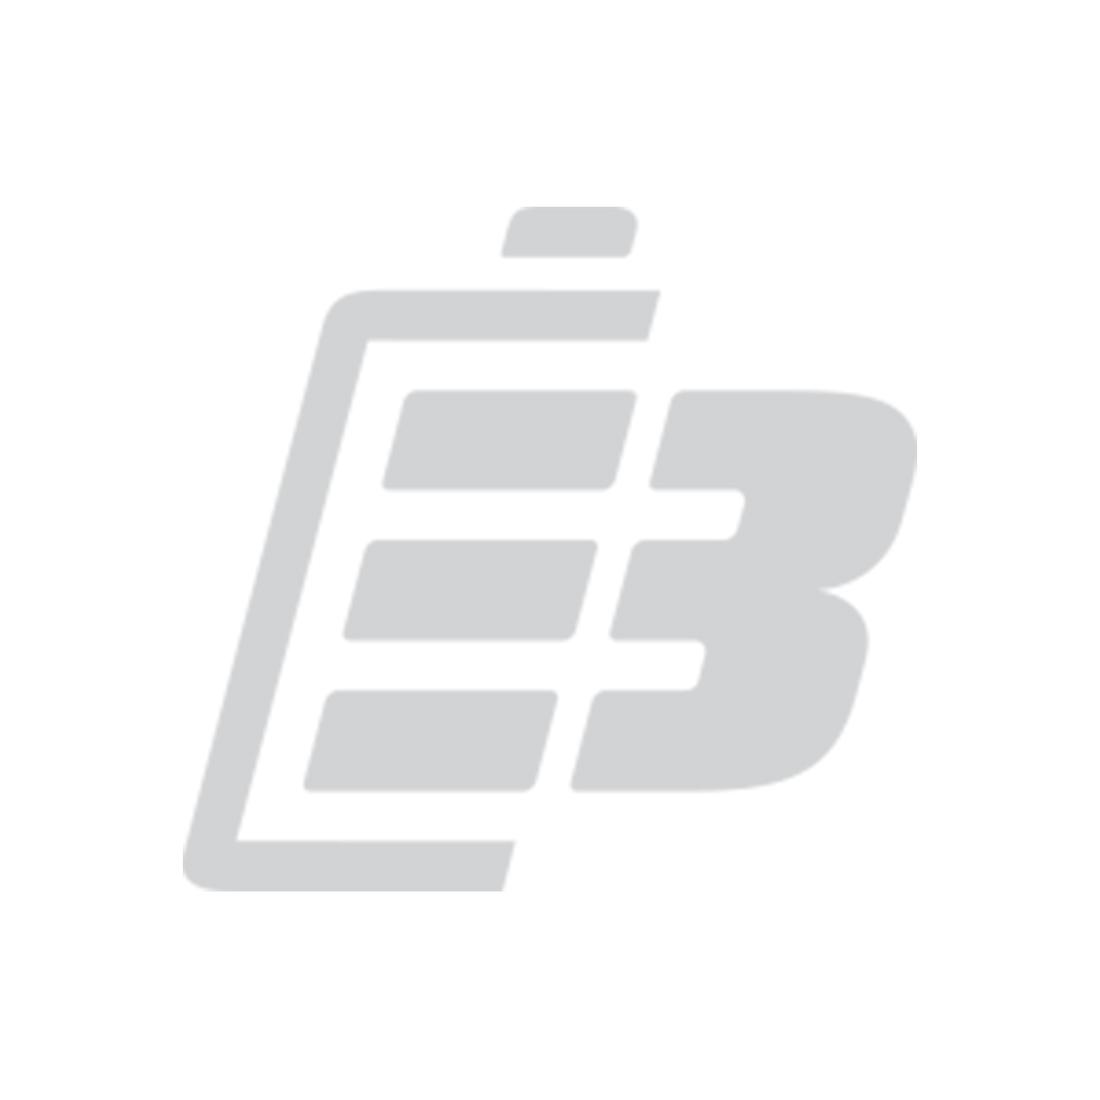 Smartphone battery Lenovo A1_1